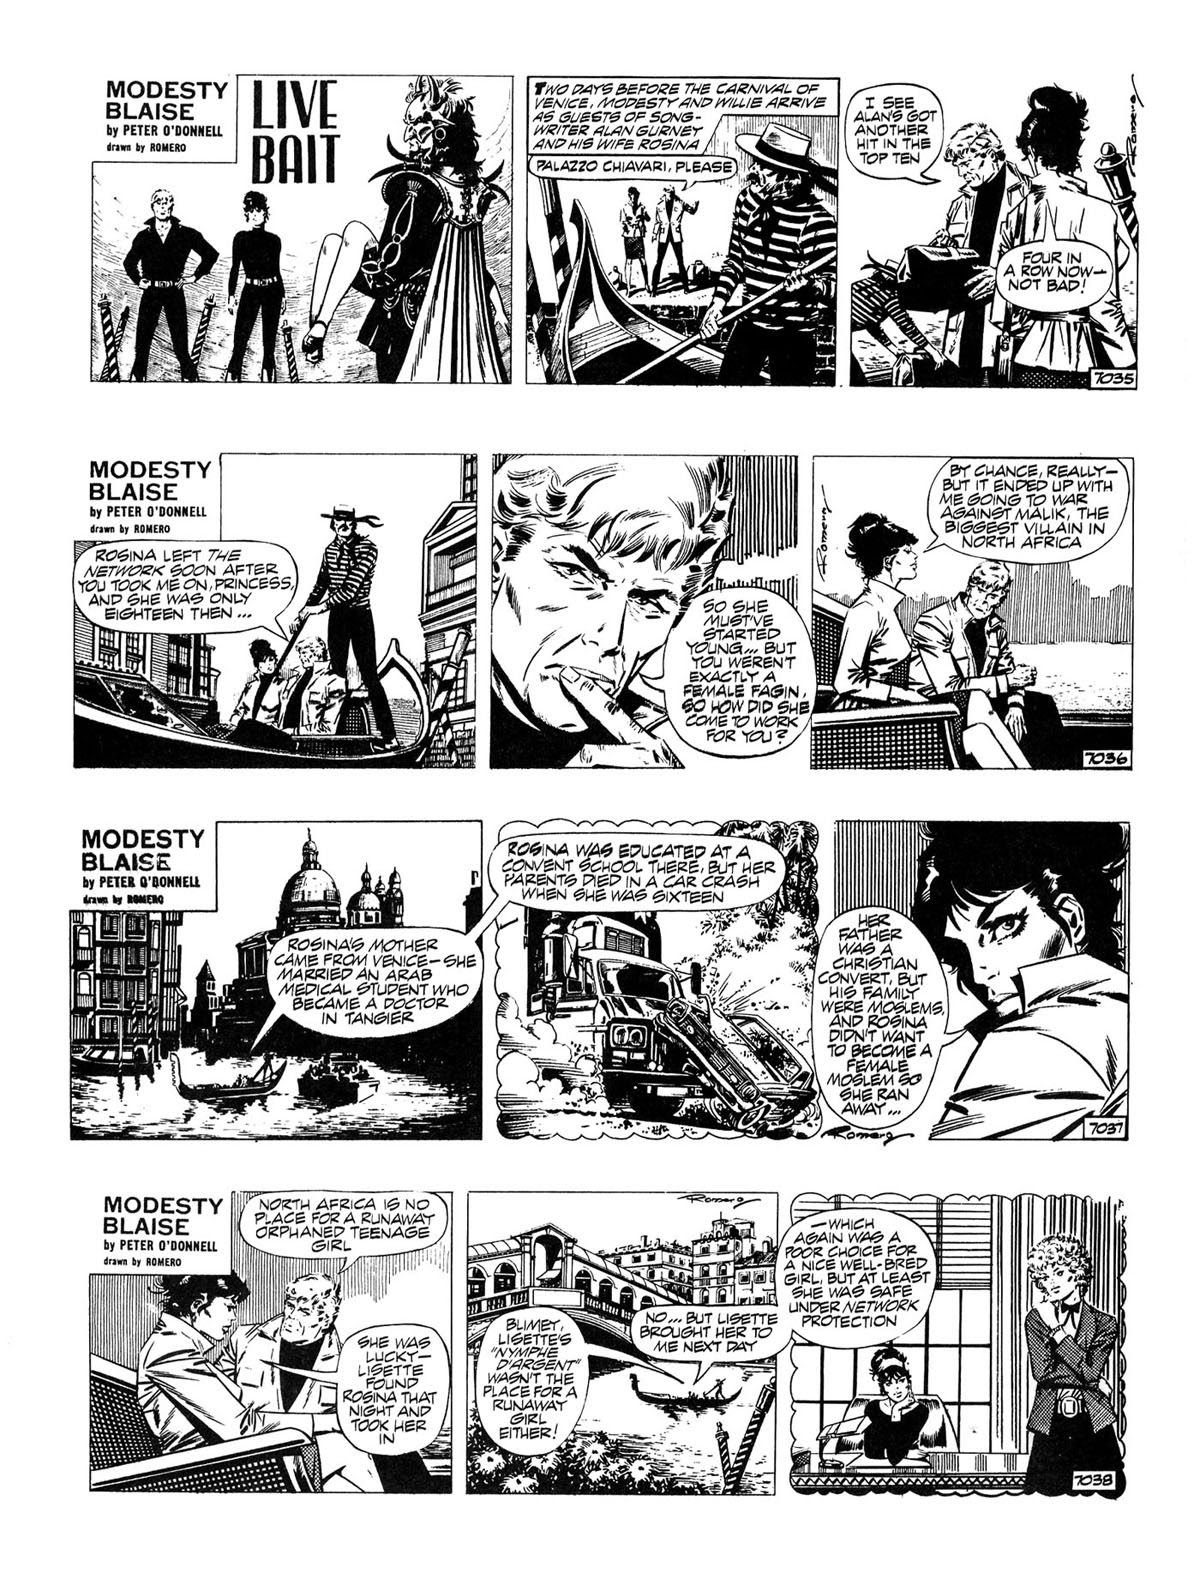 Read online Modesty Blaise Live bait comic -  Issue # TPB - 2